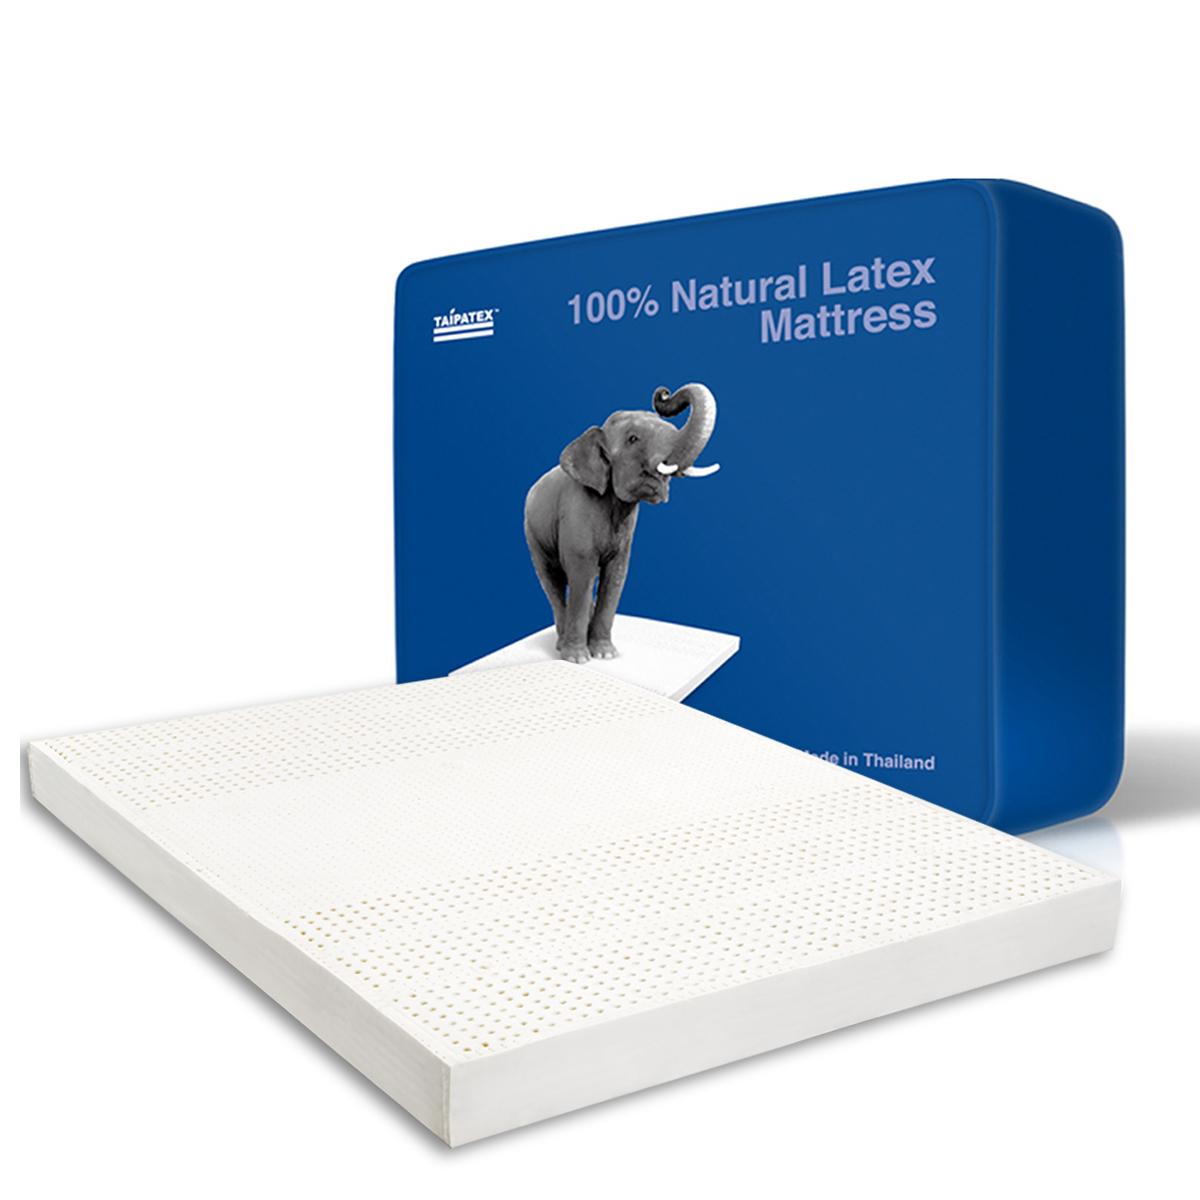 TAIPATEX泰國原裝進口天然乳膠 床墊7.5cmx150cmx200cm送2枕頭